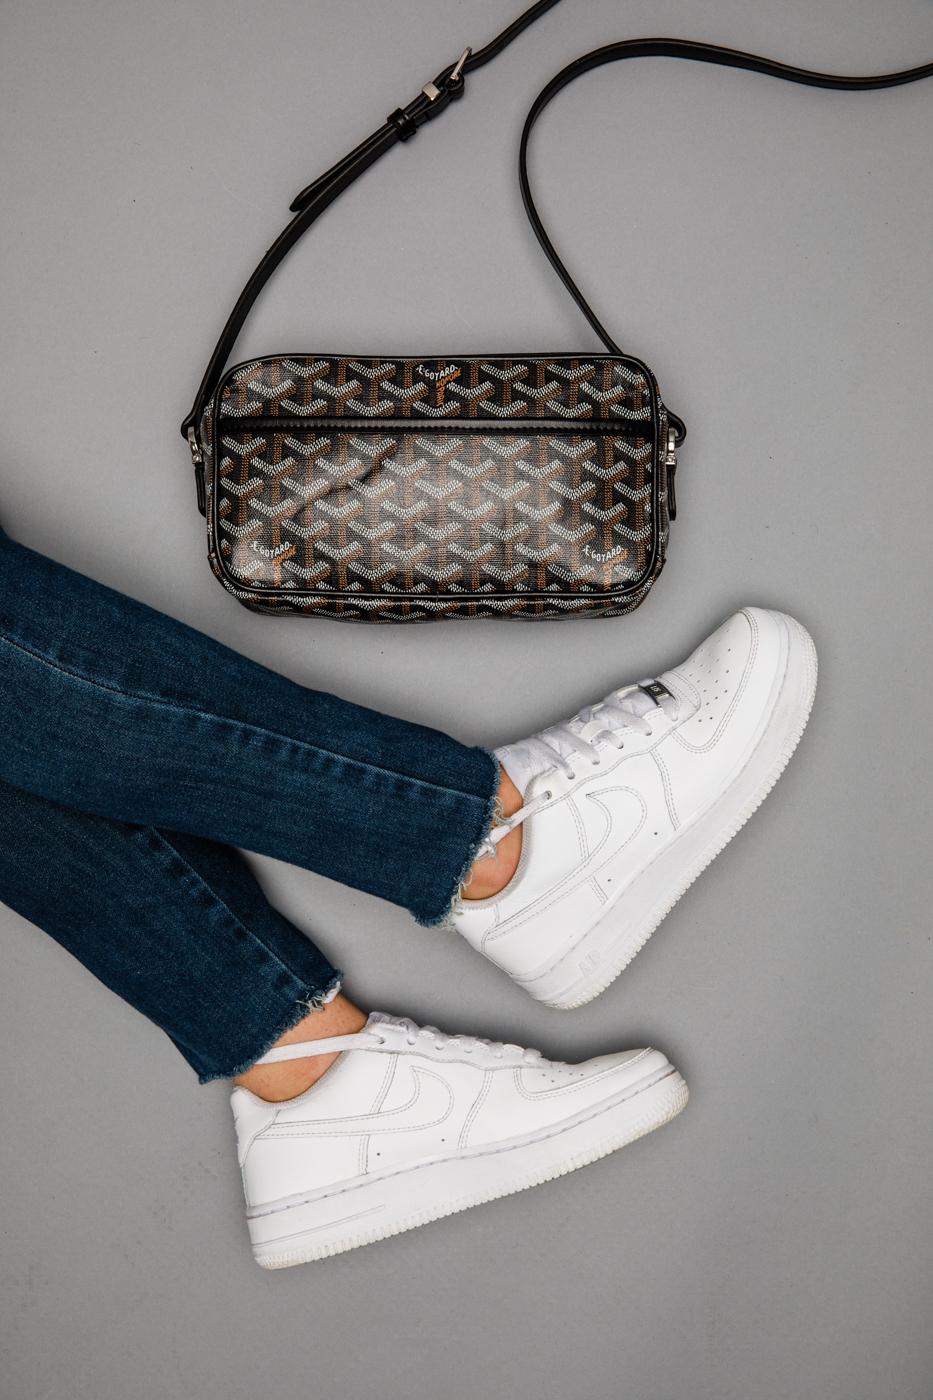 The Ultimate Sneaker Amp Handbag Matchups Of The Season